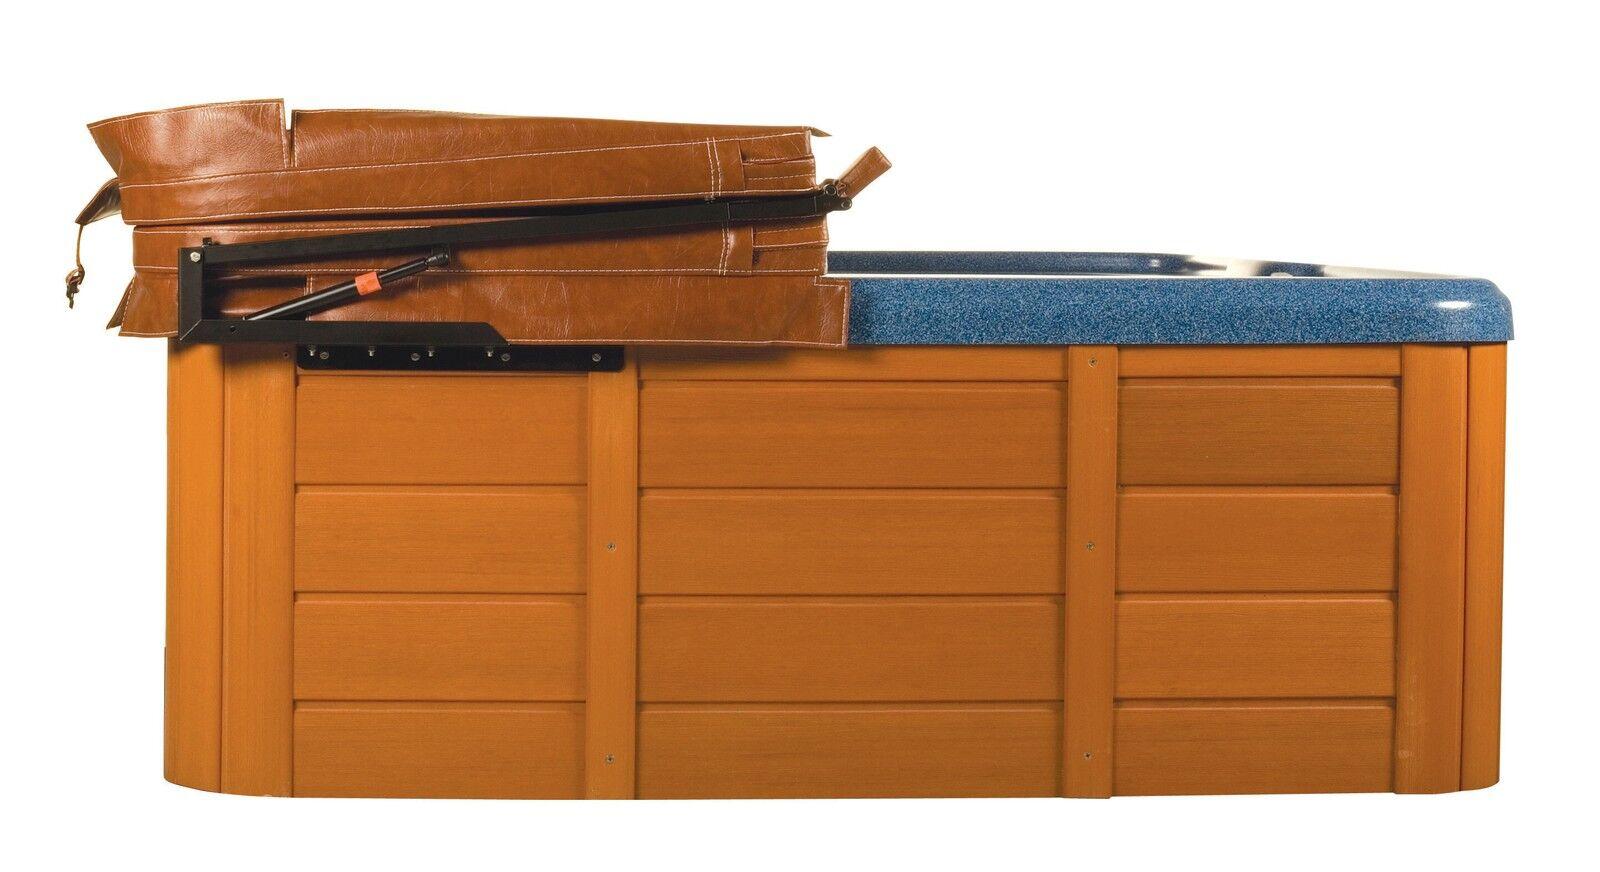 Cover Valet 250 Spa Cover Lift - 7910 | eBay